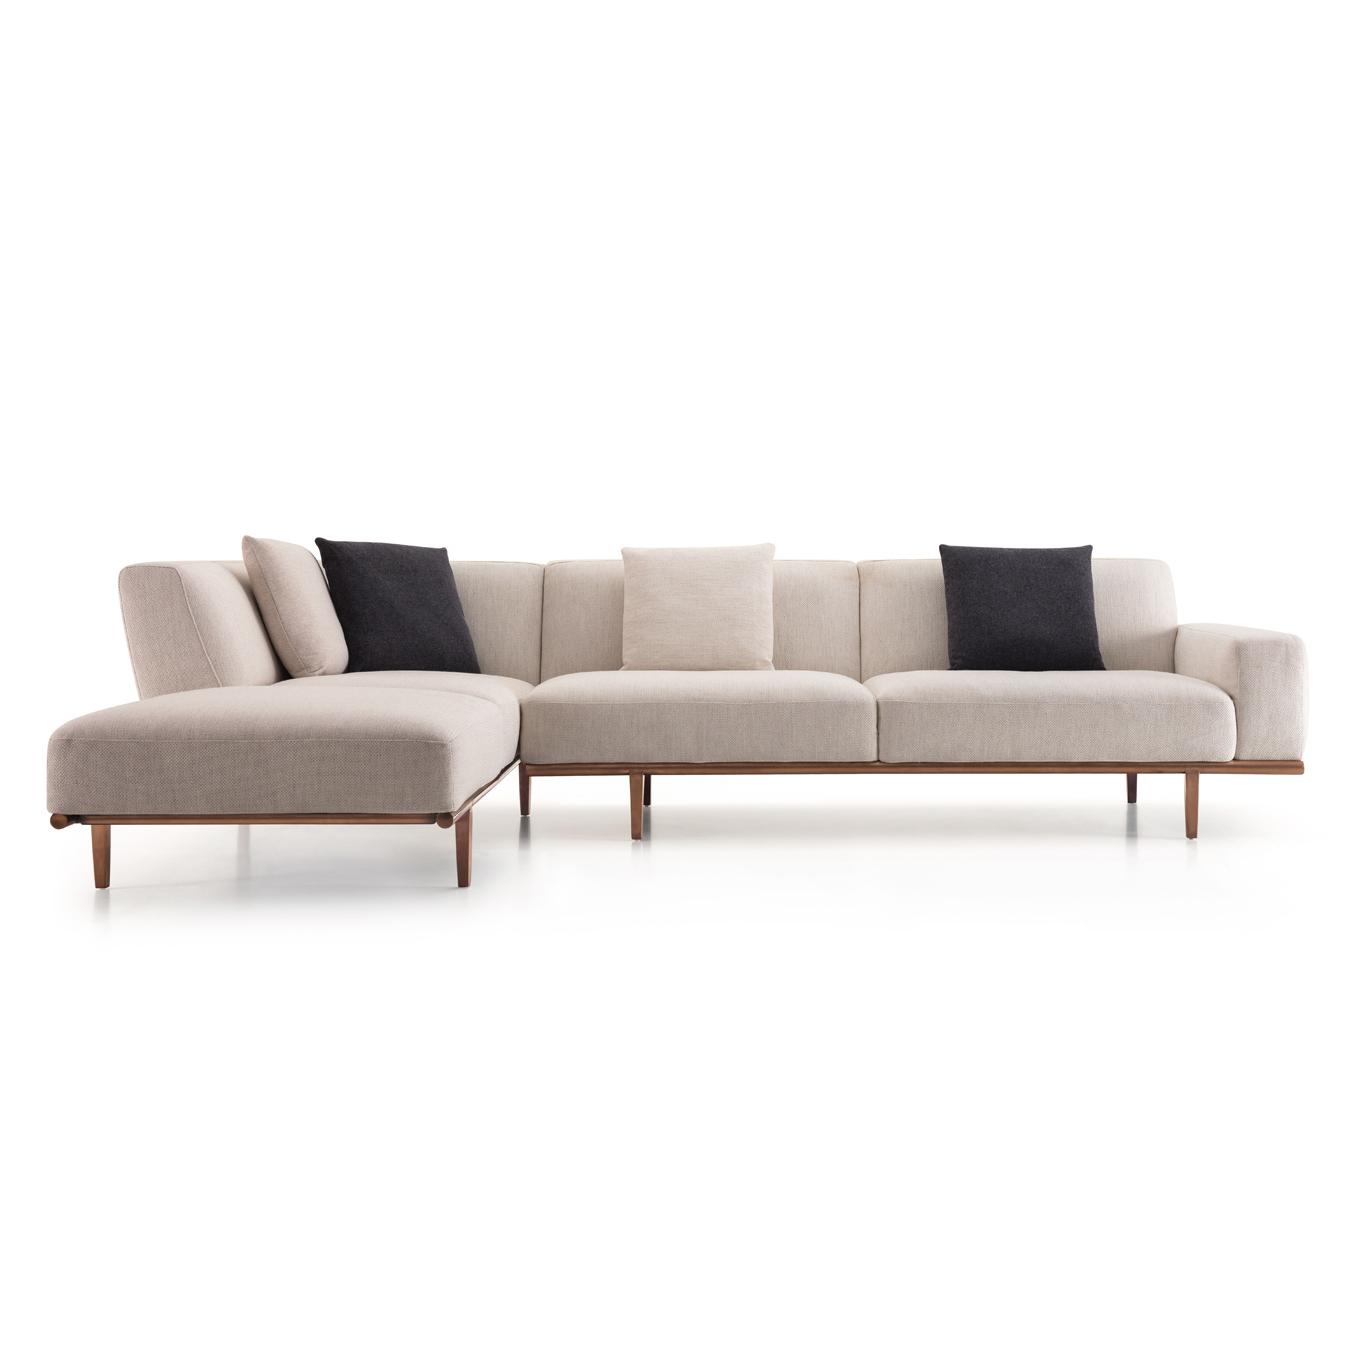 Recent Beige Sofas Throughout Trento Corner Sofa Beige – Casa Lusso Furniture Uae (View 2 of 20)